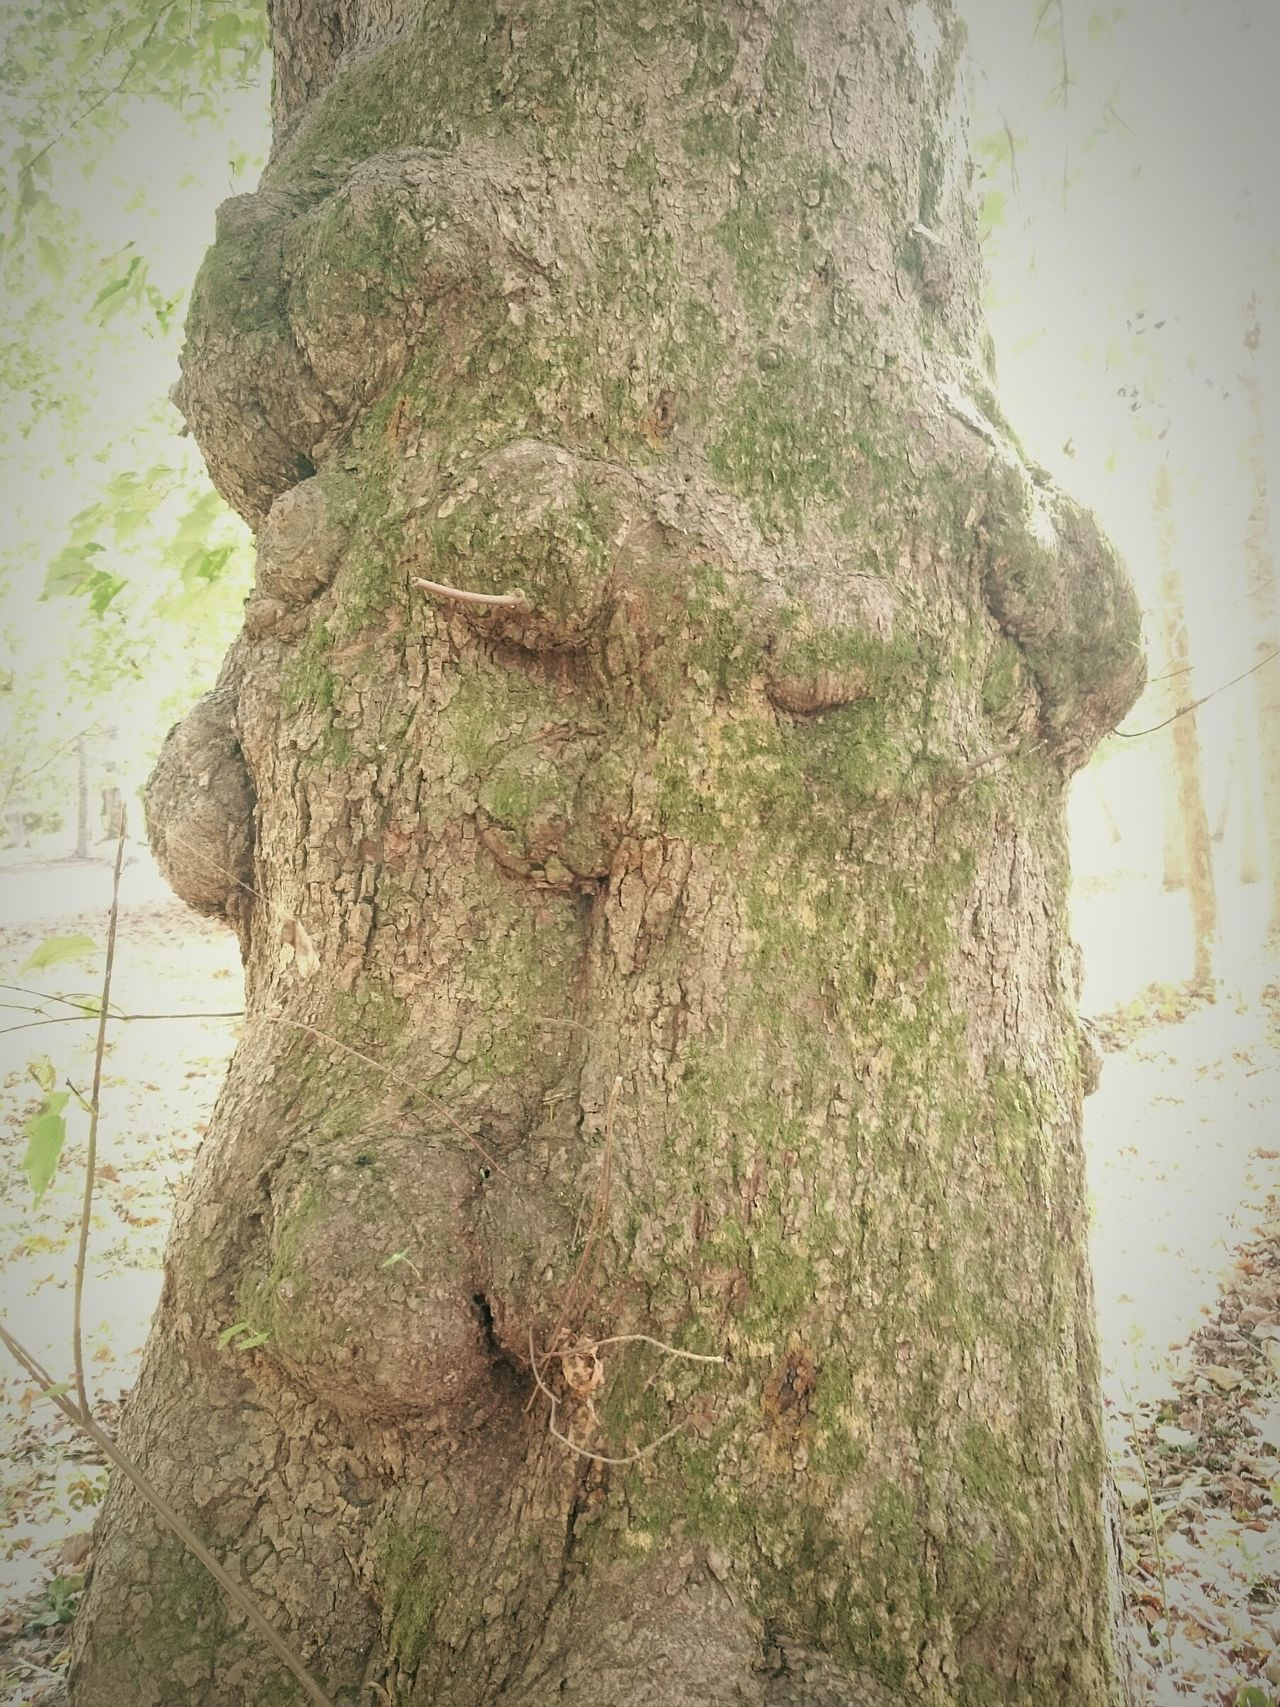 Elemental Tree Spirit Nature Tree Trunk Outdoors Betweenworlds Iam Seer Secrets Moss Spirit Sleepytrees Treeple